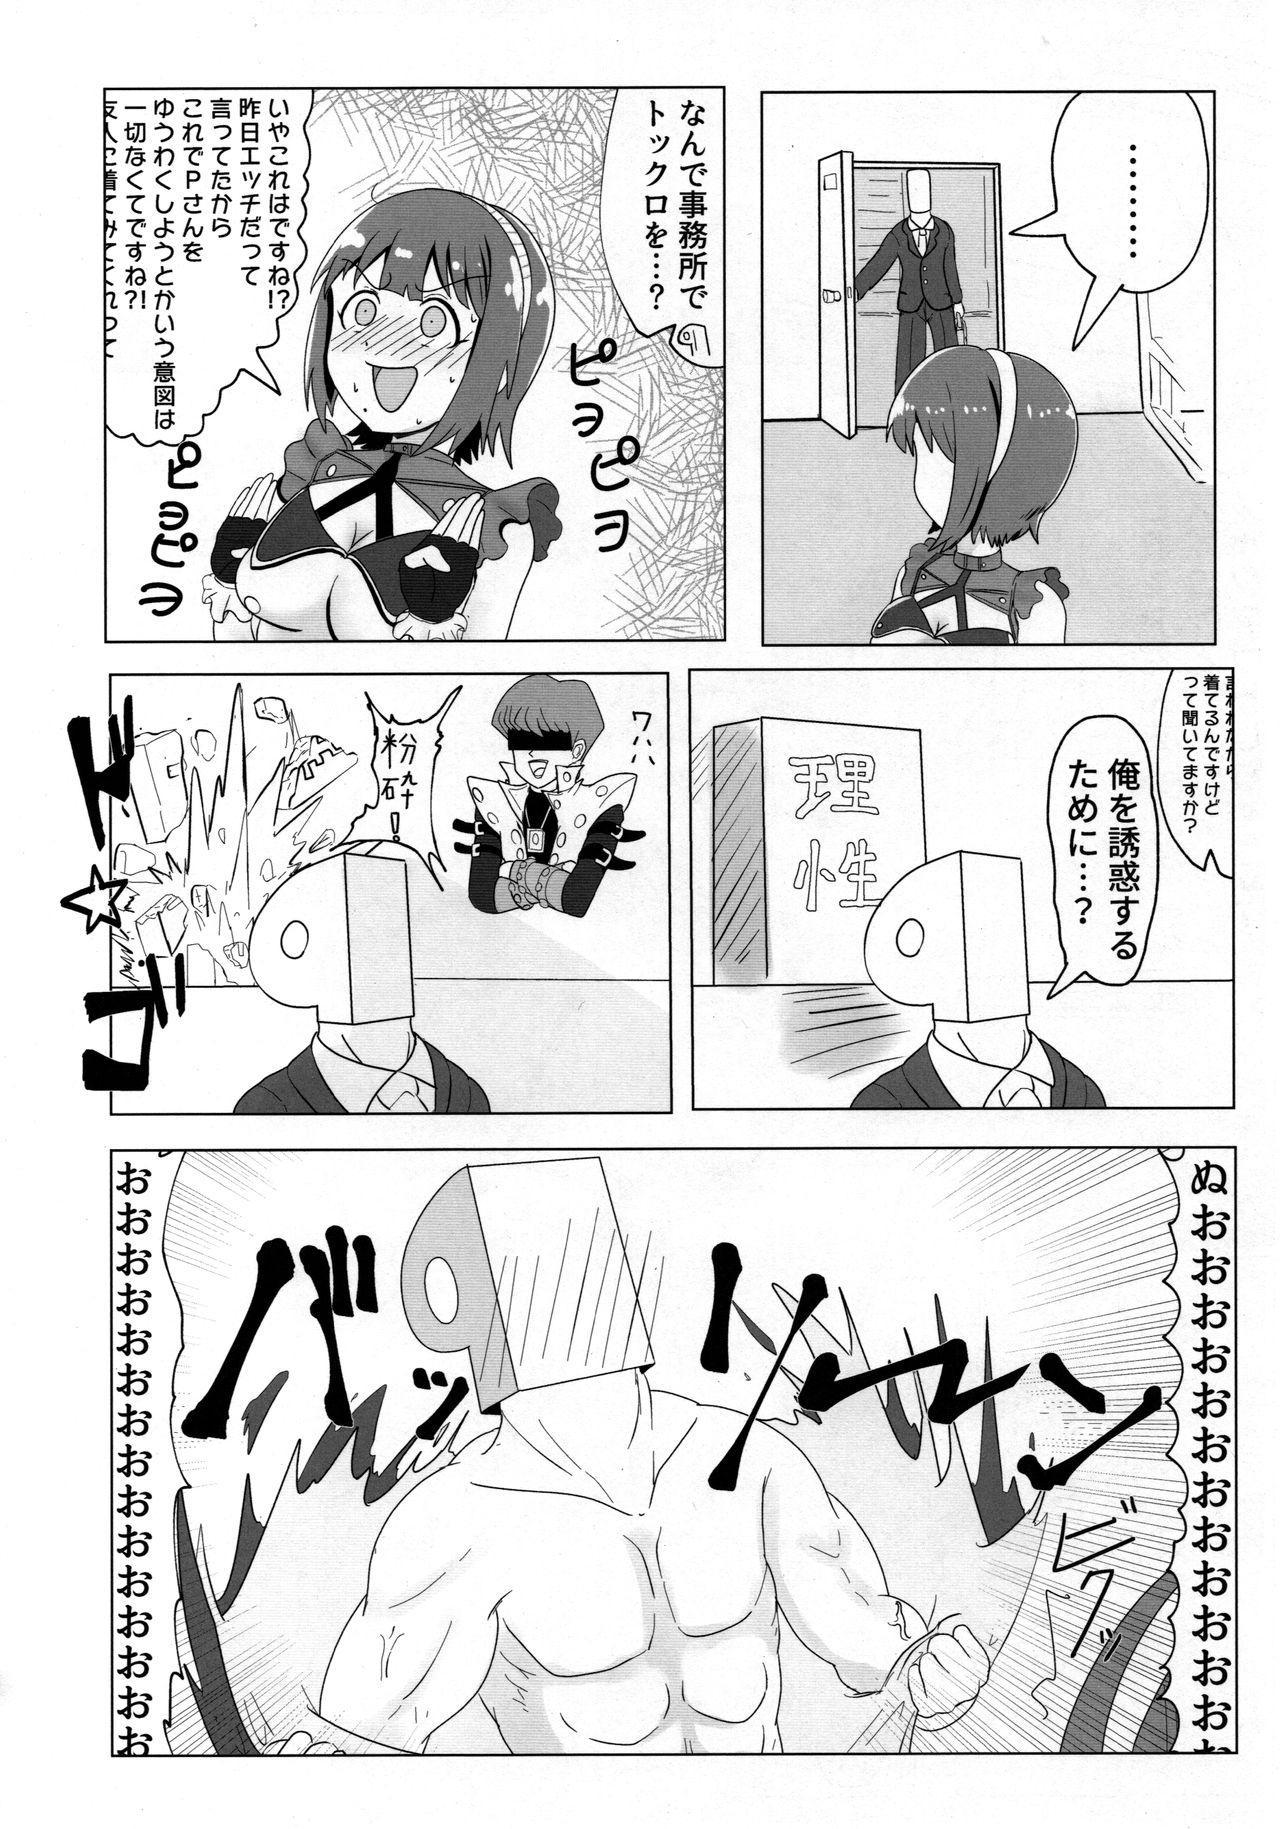 Dosukebe Ishou TOP! CLOVER wo Yurusuna 26